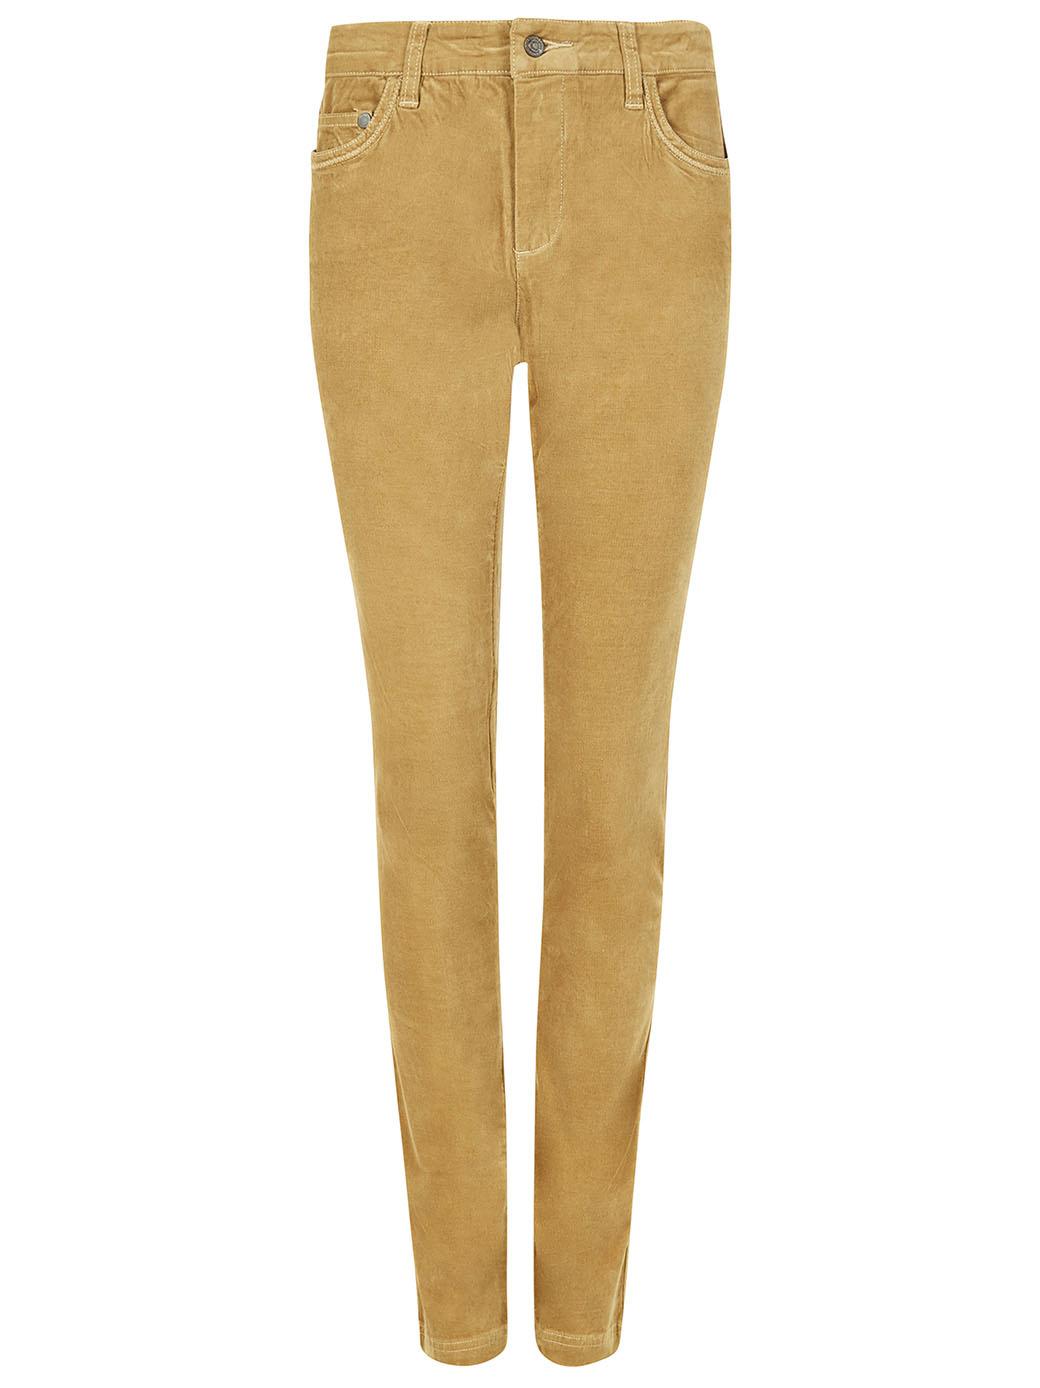 Dubarry Honeysuckle Corduroy stretchbroek - Camel-1